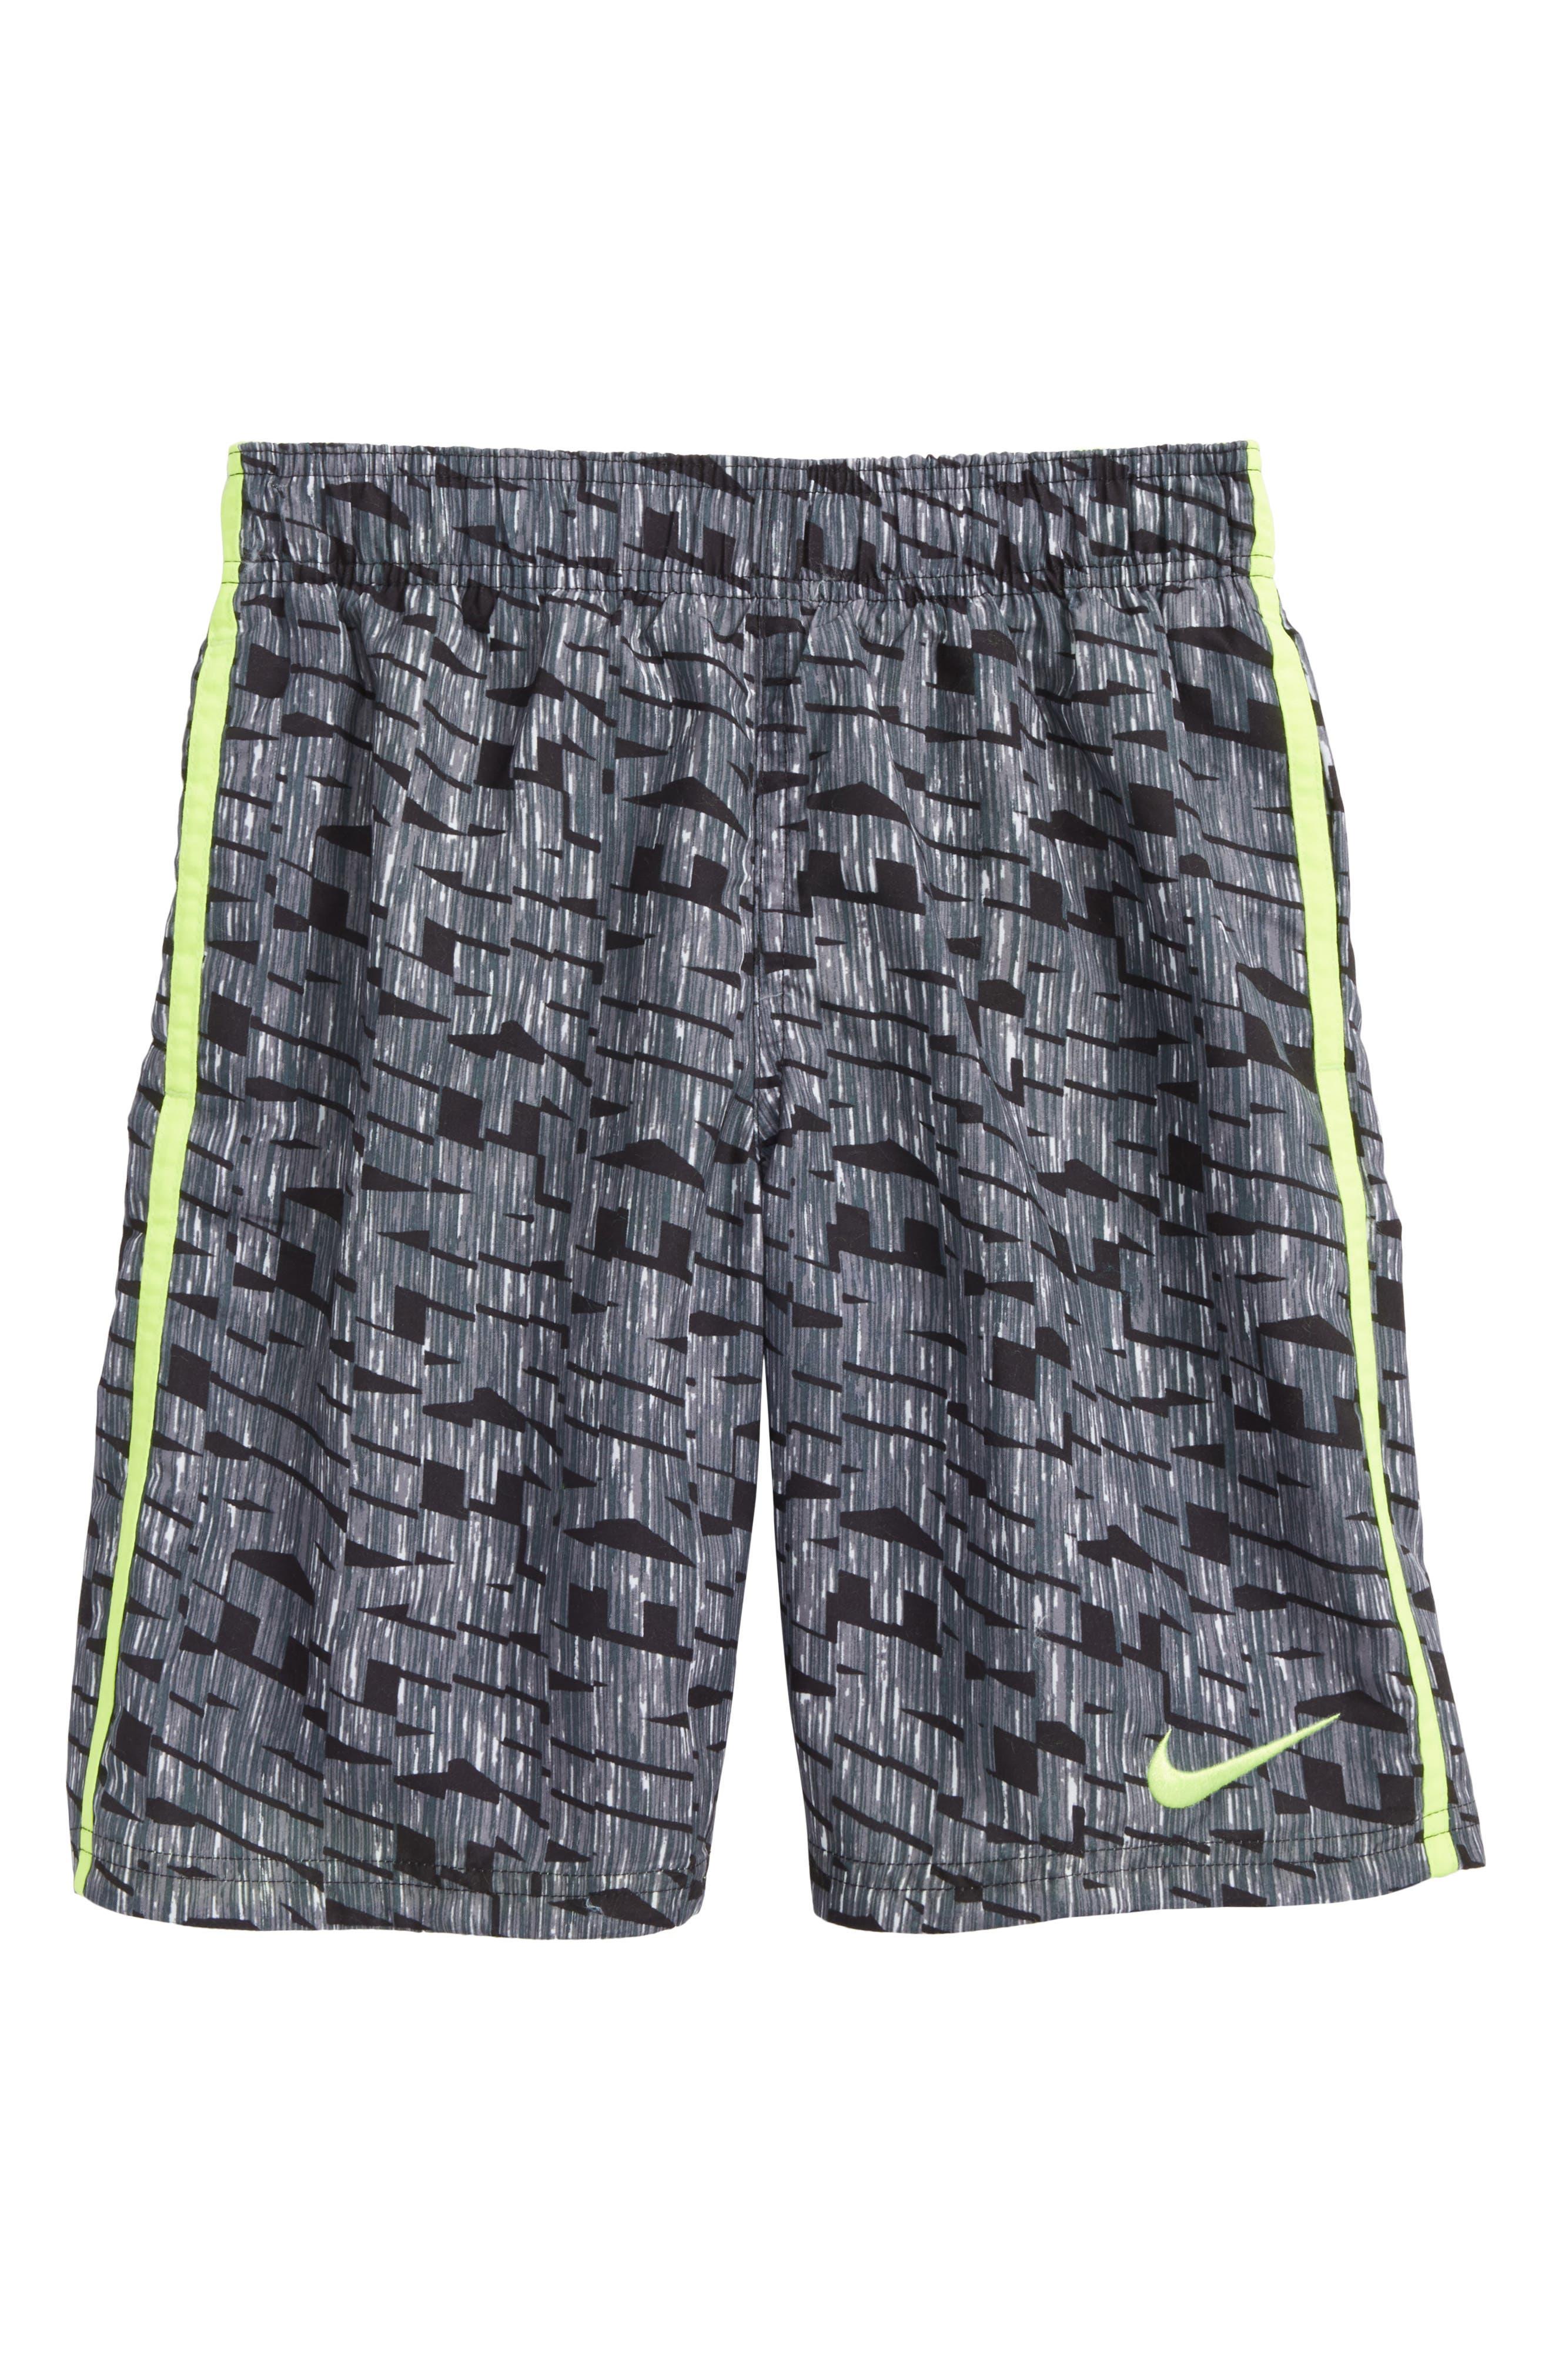 Diverge Volley Shorts,                         Main,                         color, Black